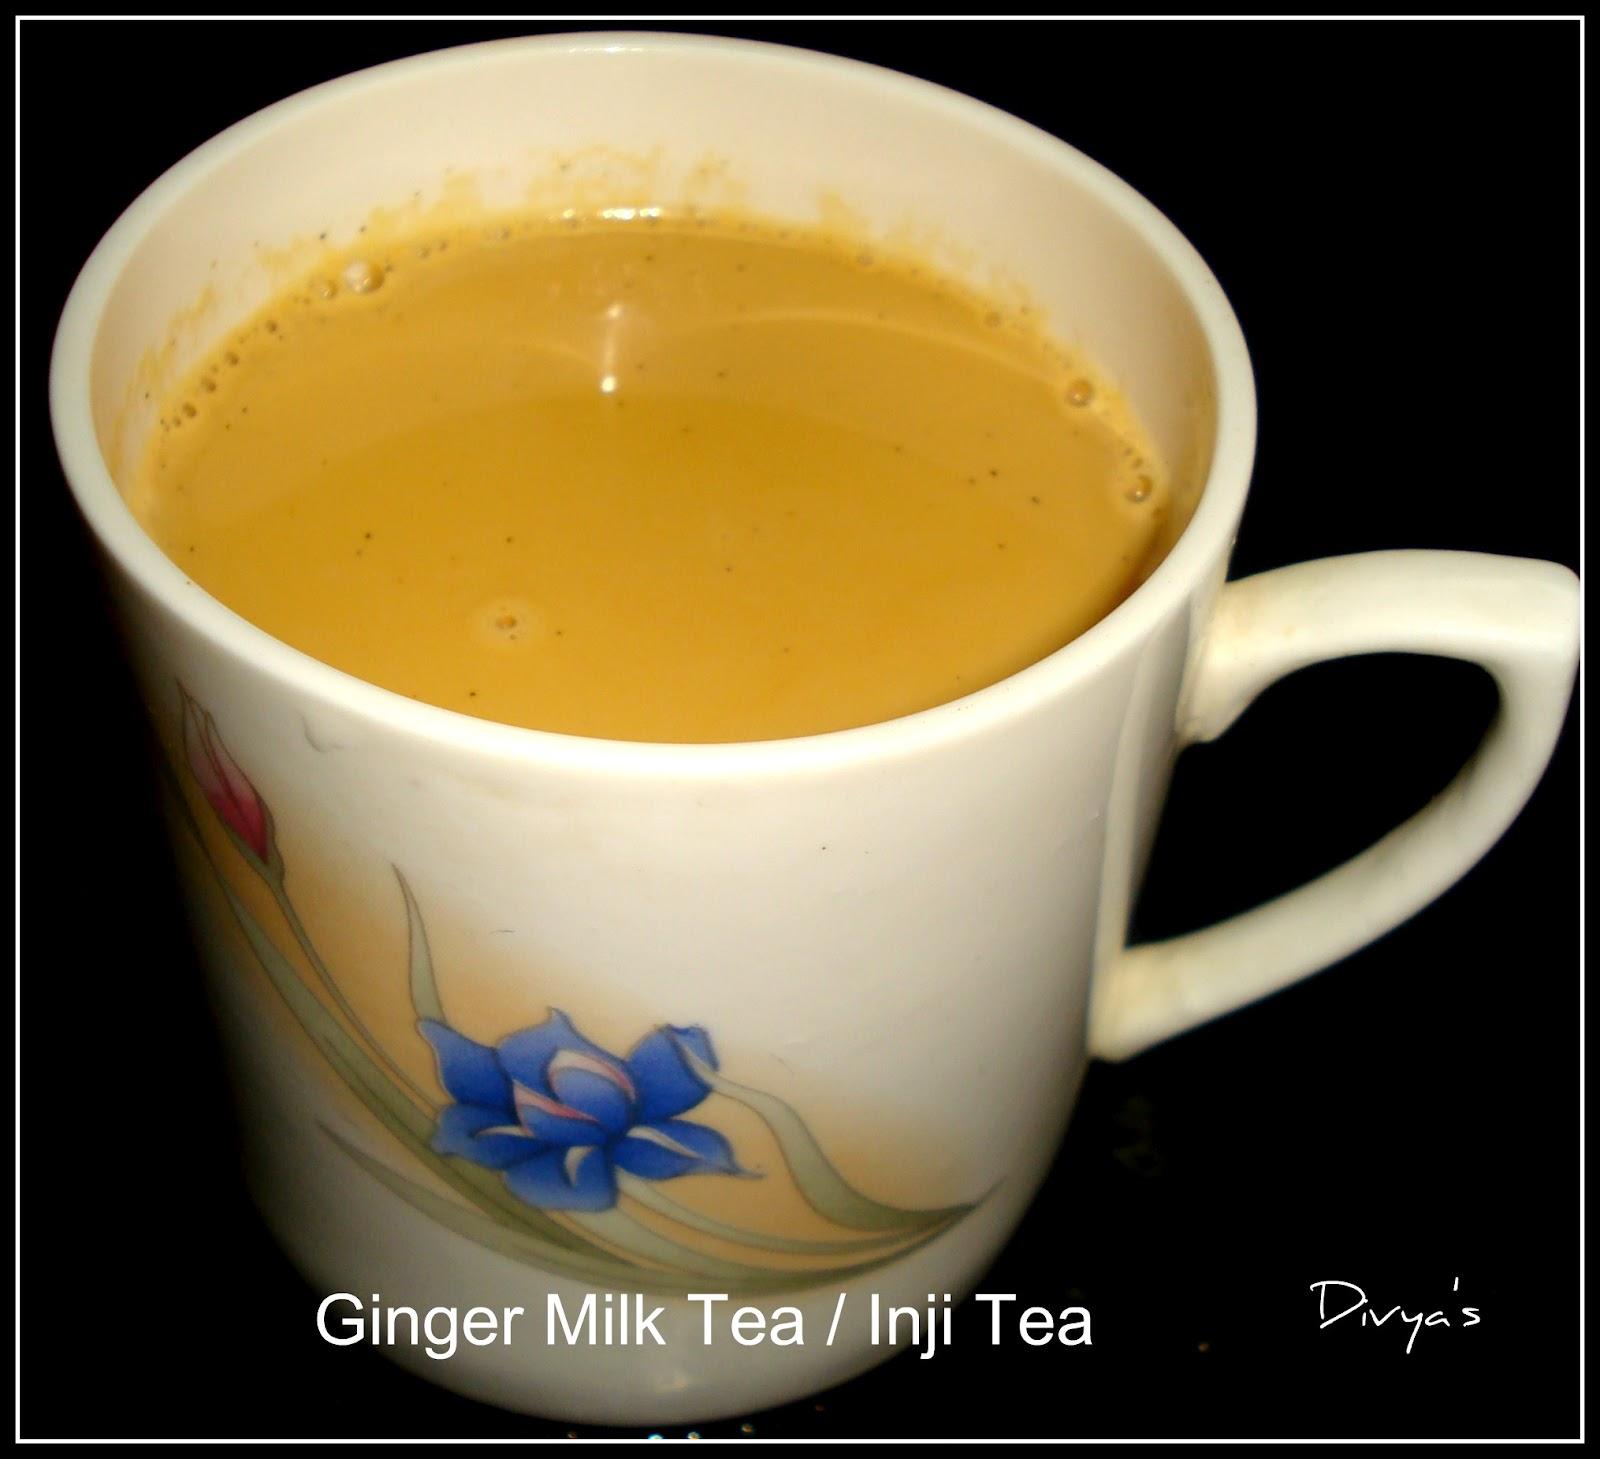 Ginger Milk Tea Inji Tea You Too Can Cook,Bamboo Floors Drawing